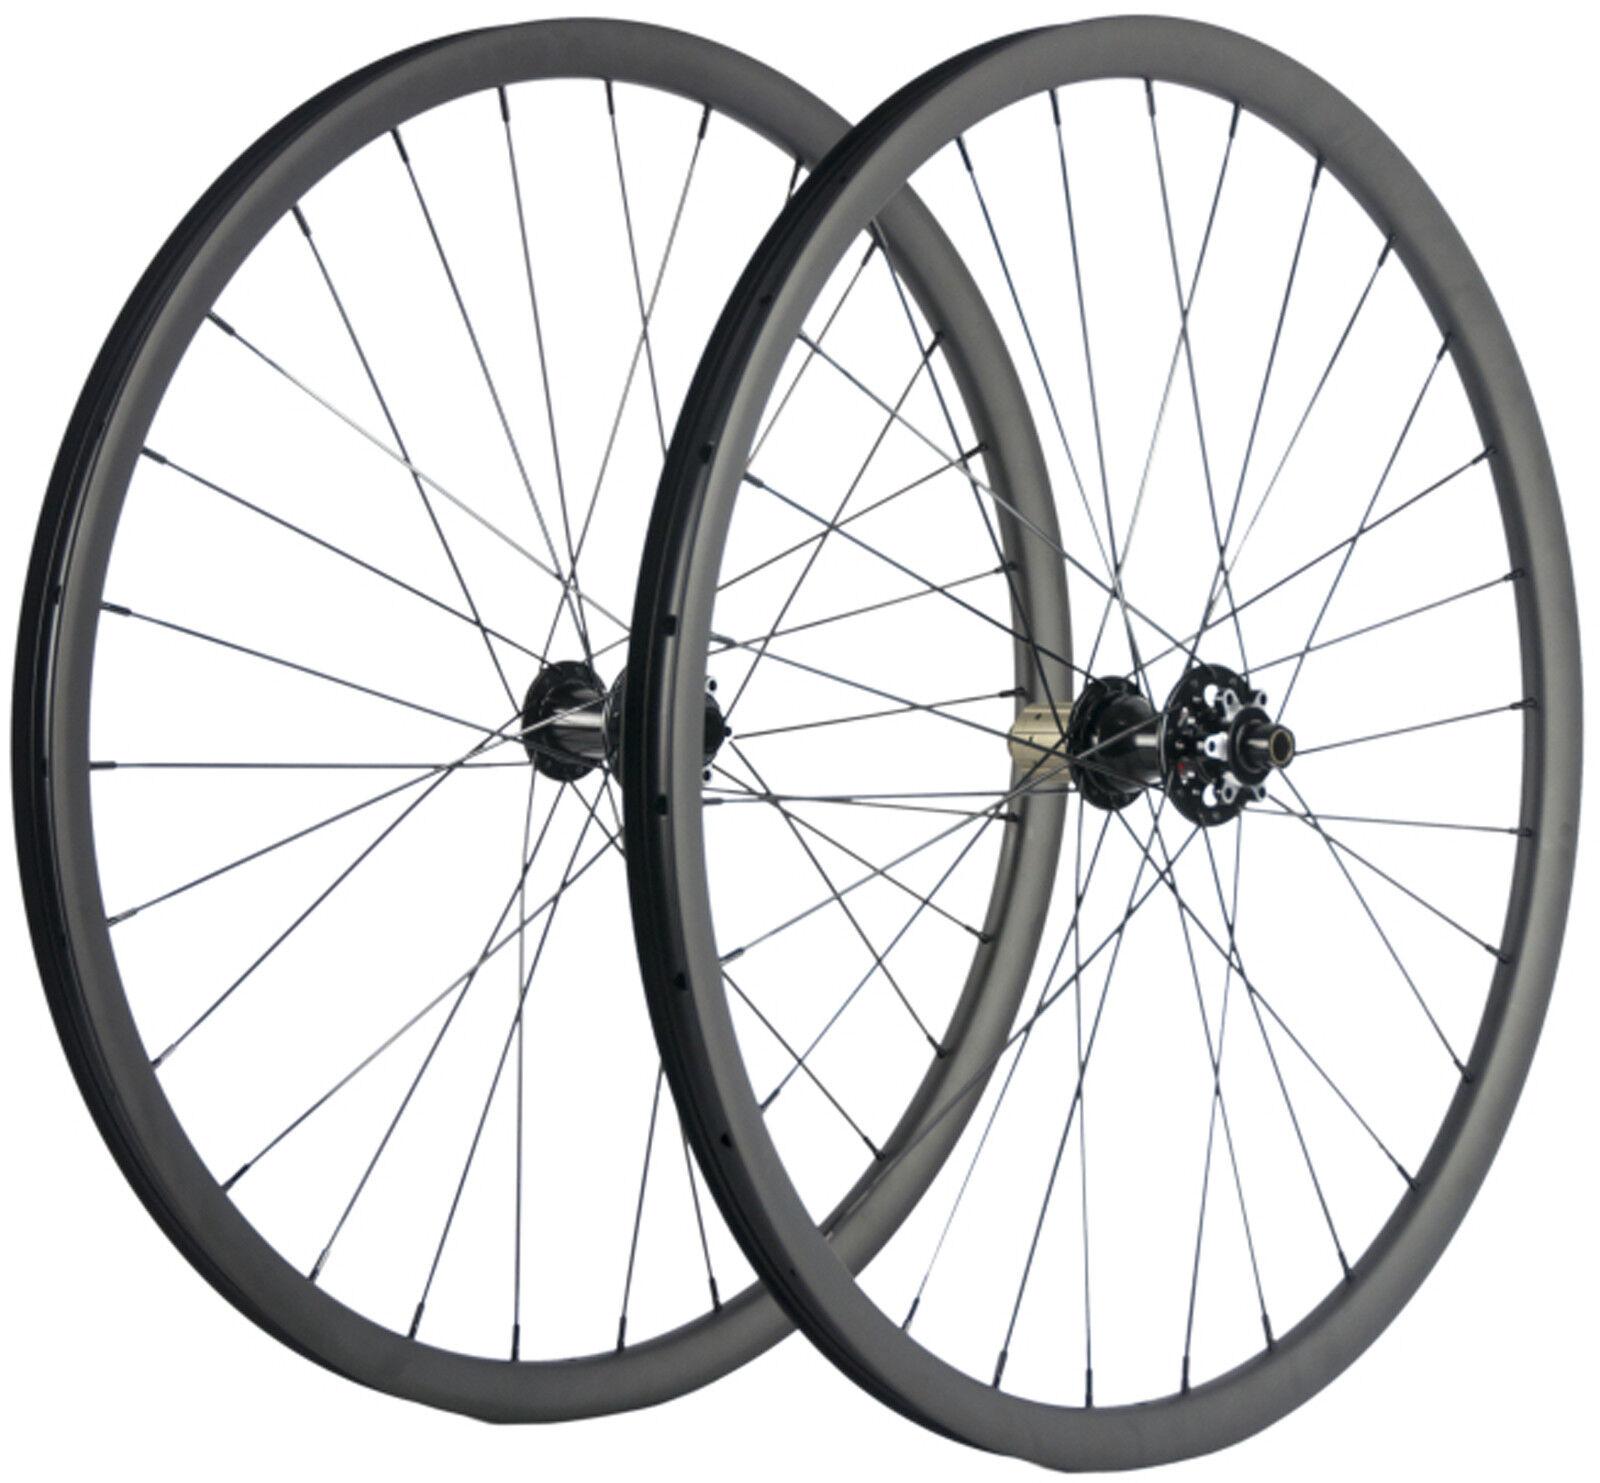 29ER Carbon MTB Wheelset 27mm Brödd berg Kolhjul Tublöst kompatiBälte